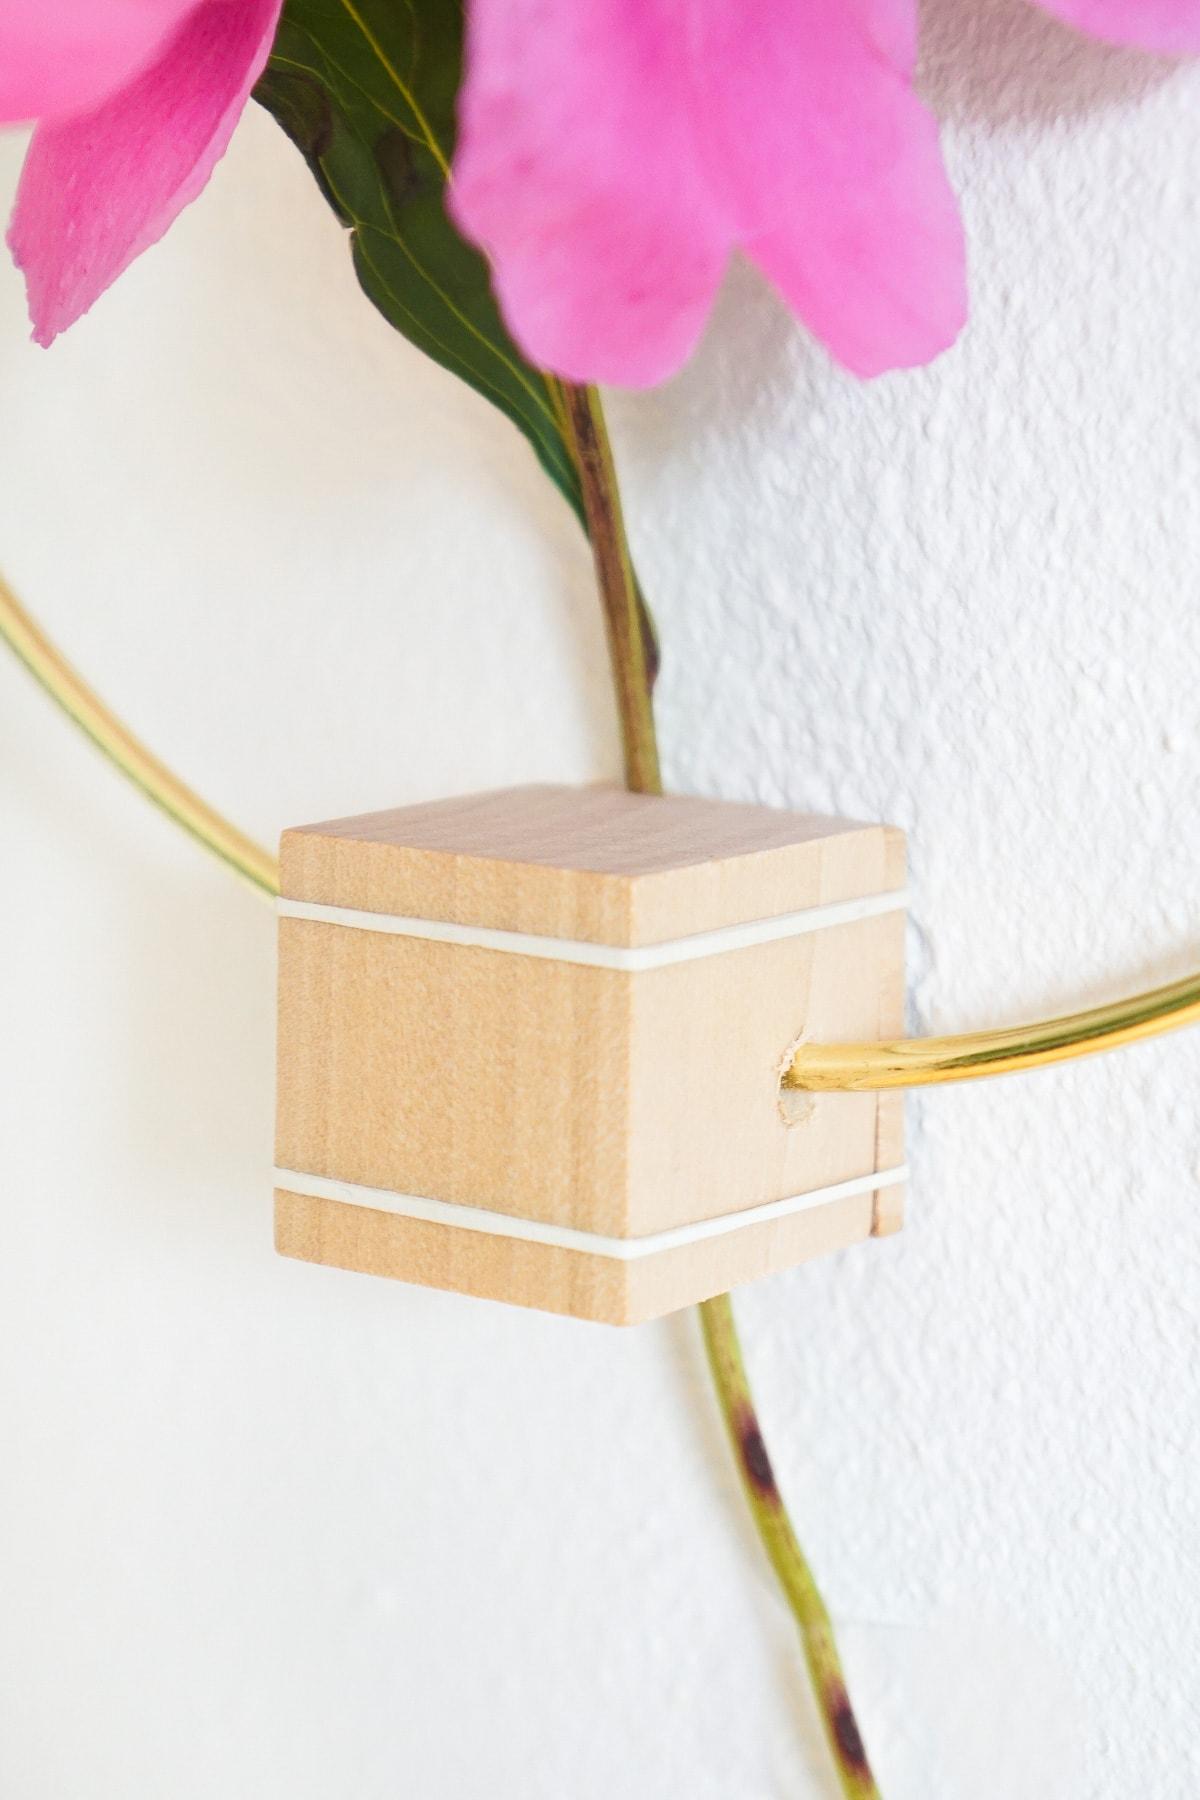 DIY Minimalist Flower Wall Hang by Ashley Rose of Sugar & Cloth, a top lifestyle blog in Houston, Texas